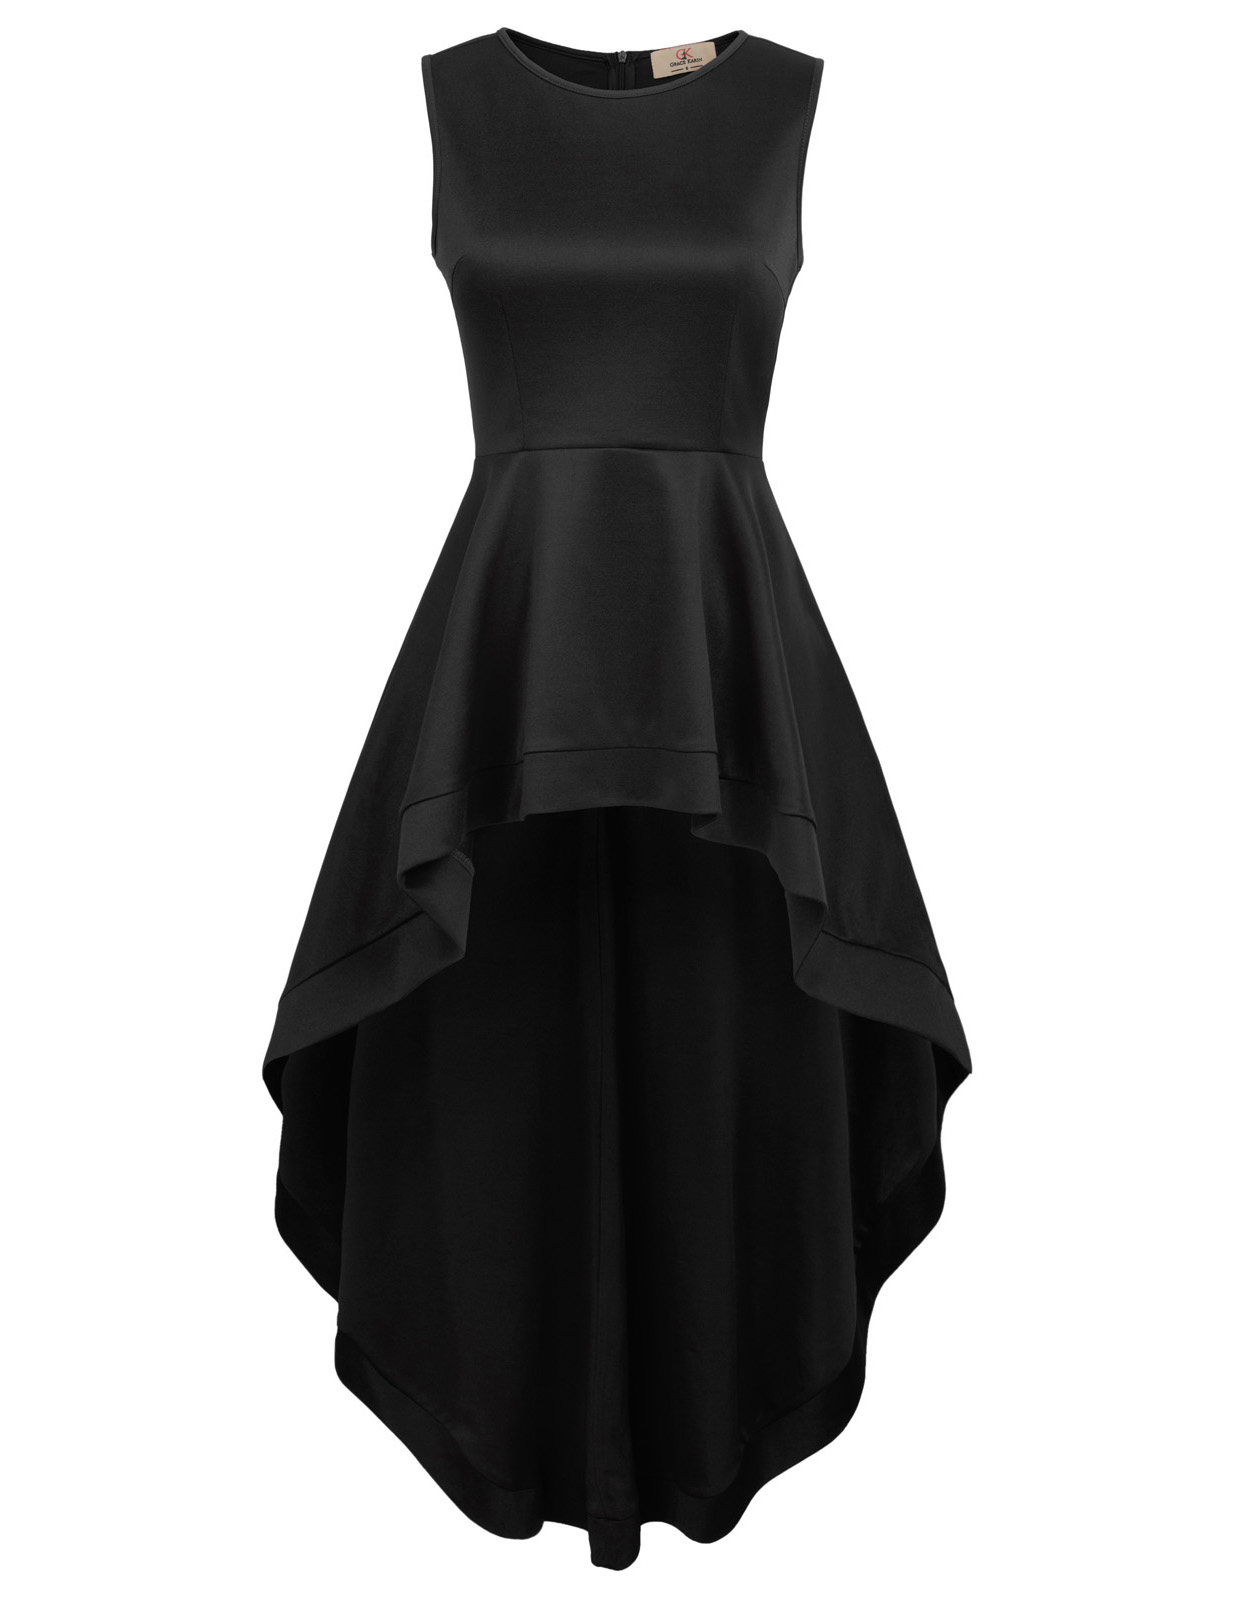 b1589b8df7a76 red black gothic maxi dress women sleeveless irregular hem wedding ...